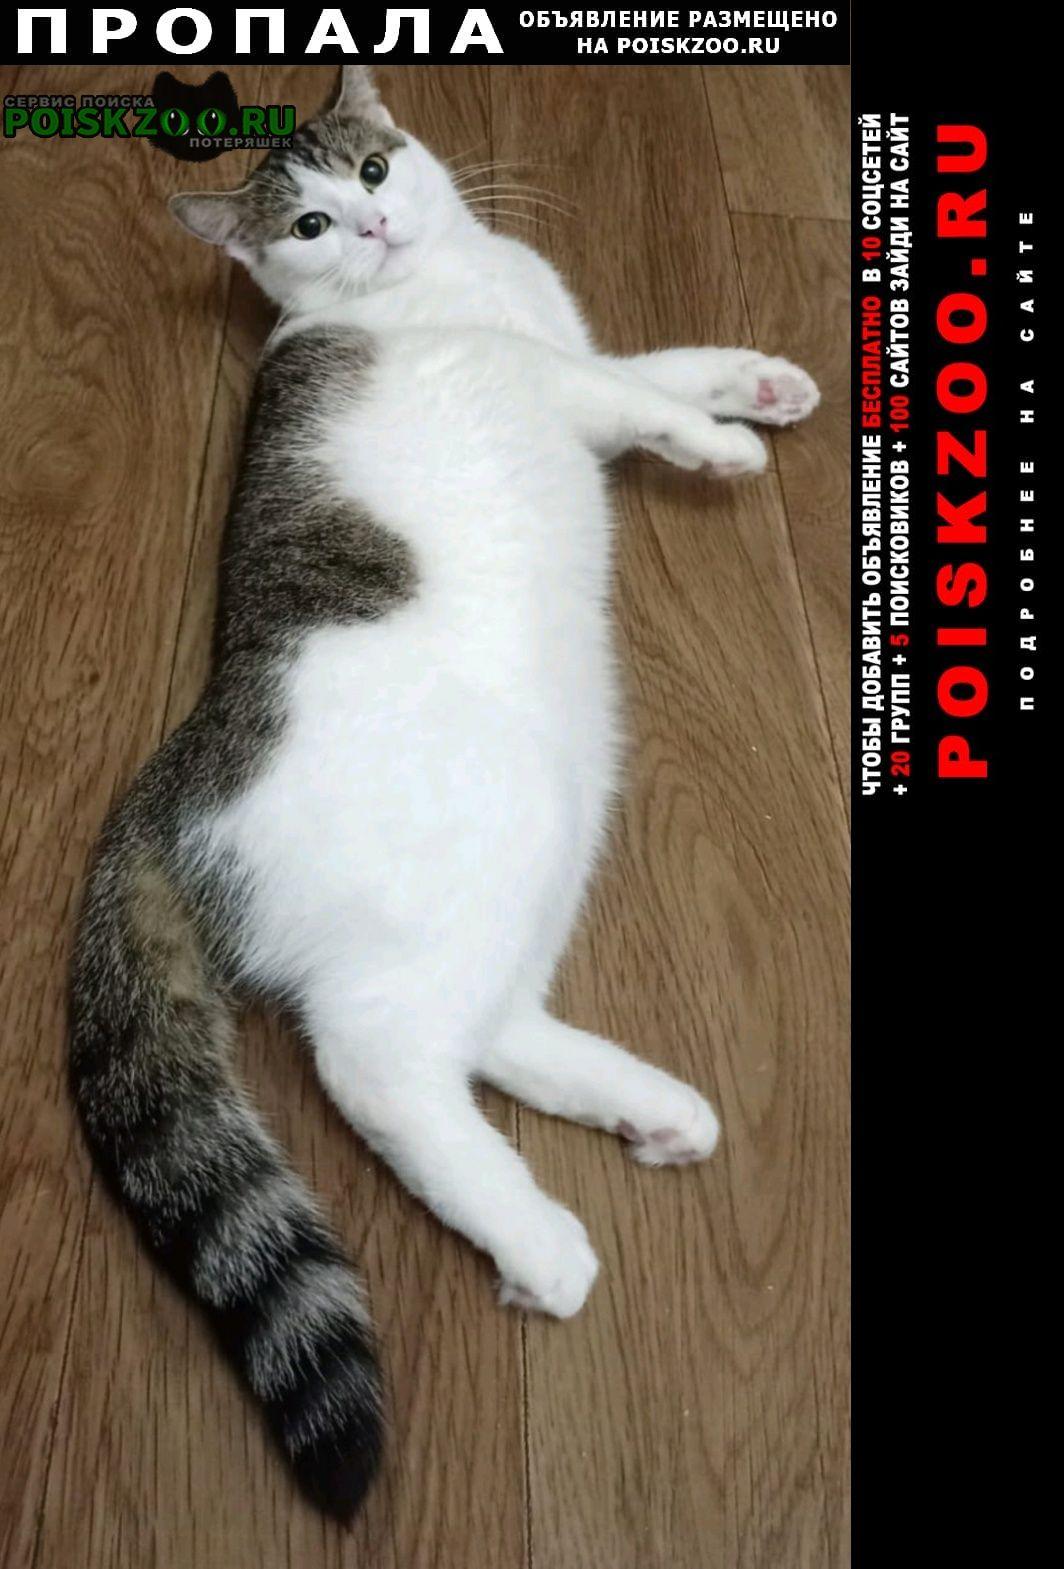 Пропала кошка кнопочка-кнопа- Псков